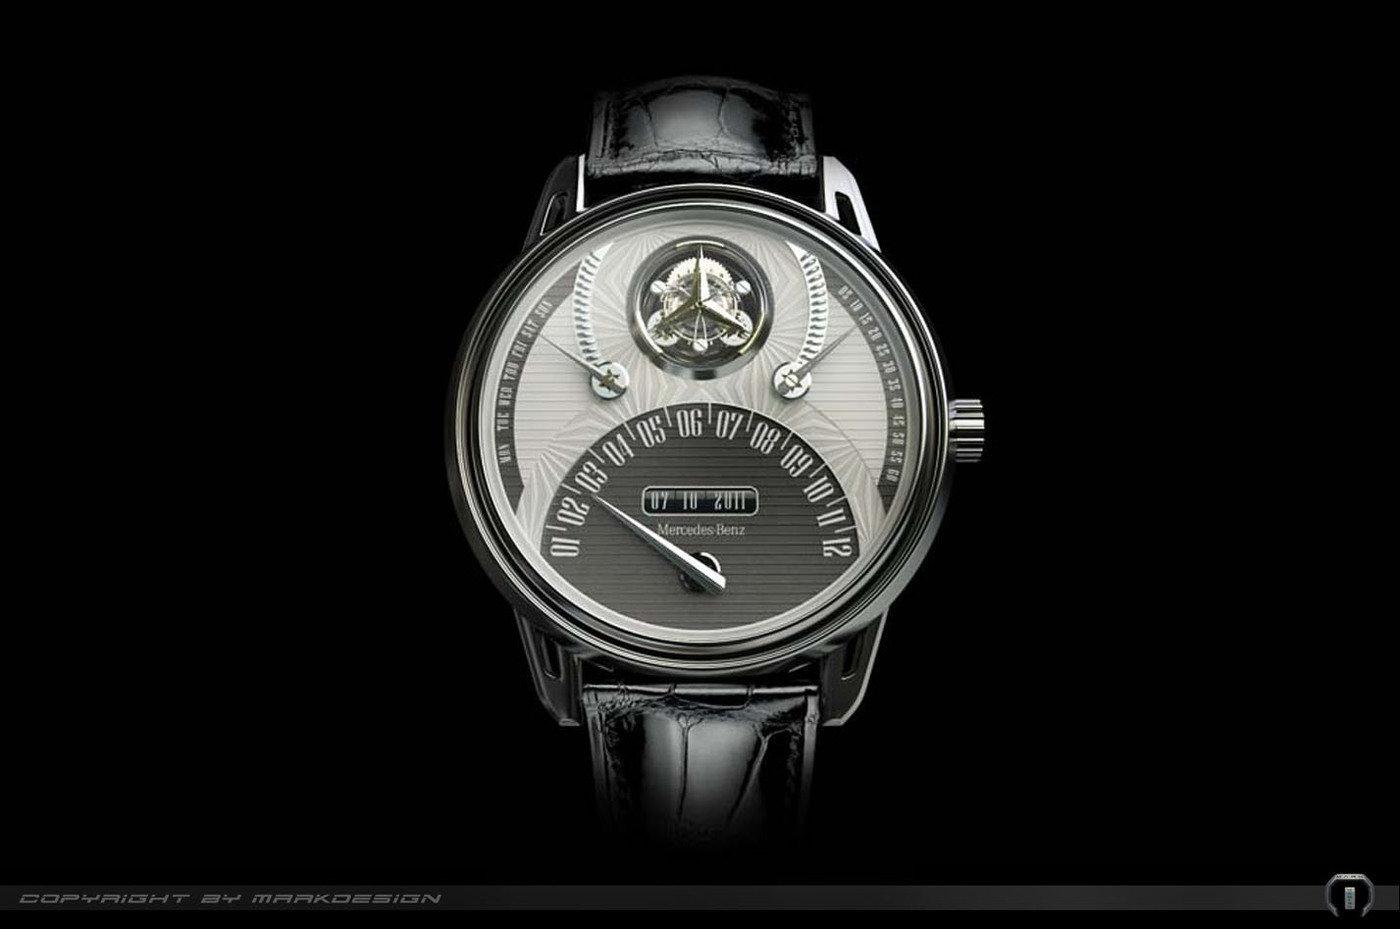 how to buy marko petrovic mercedes 320 tourbillon watch